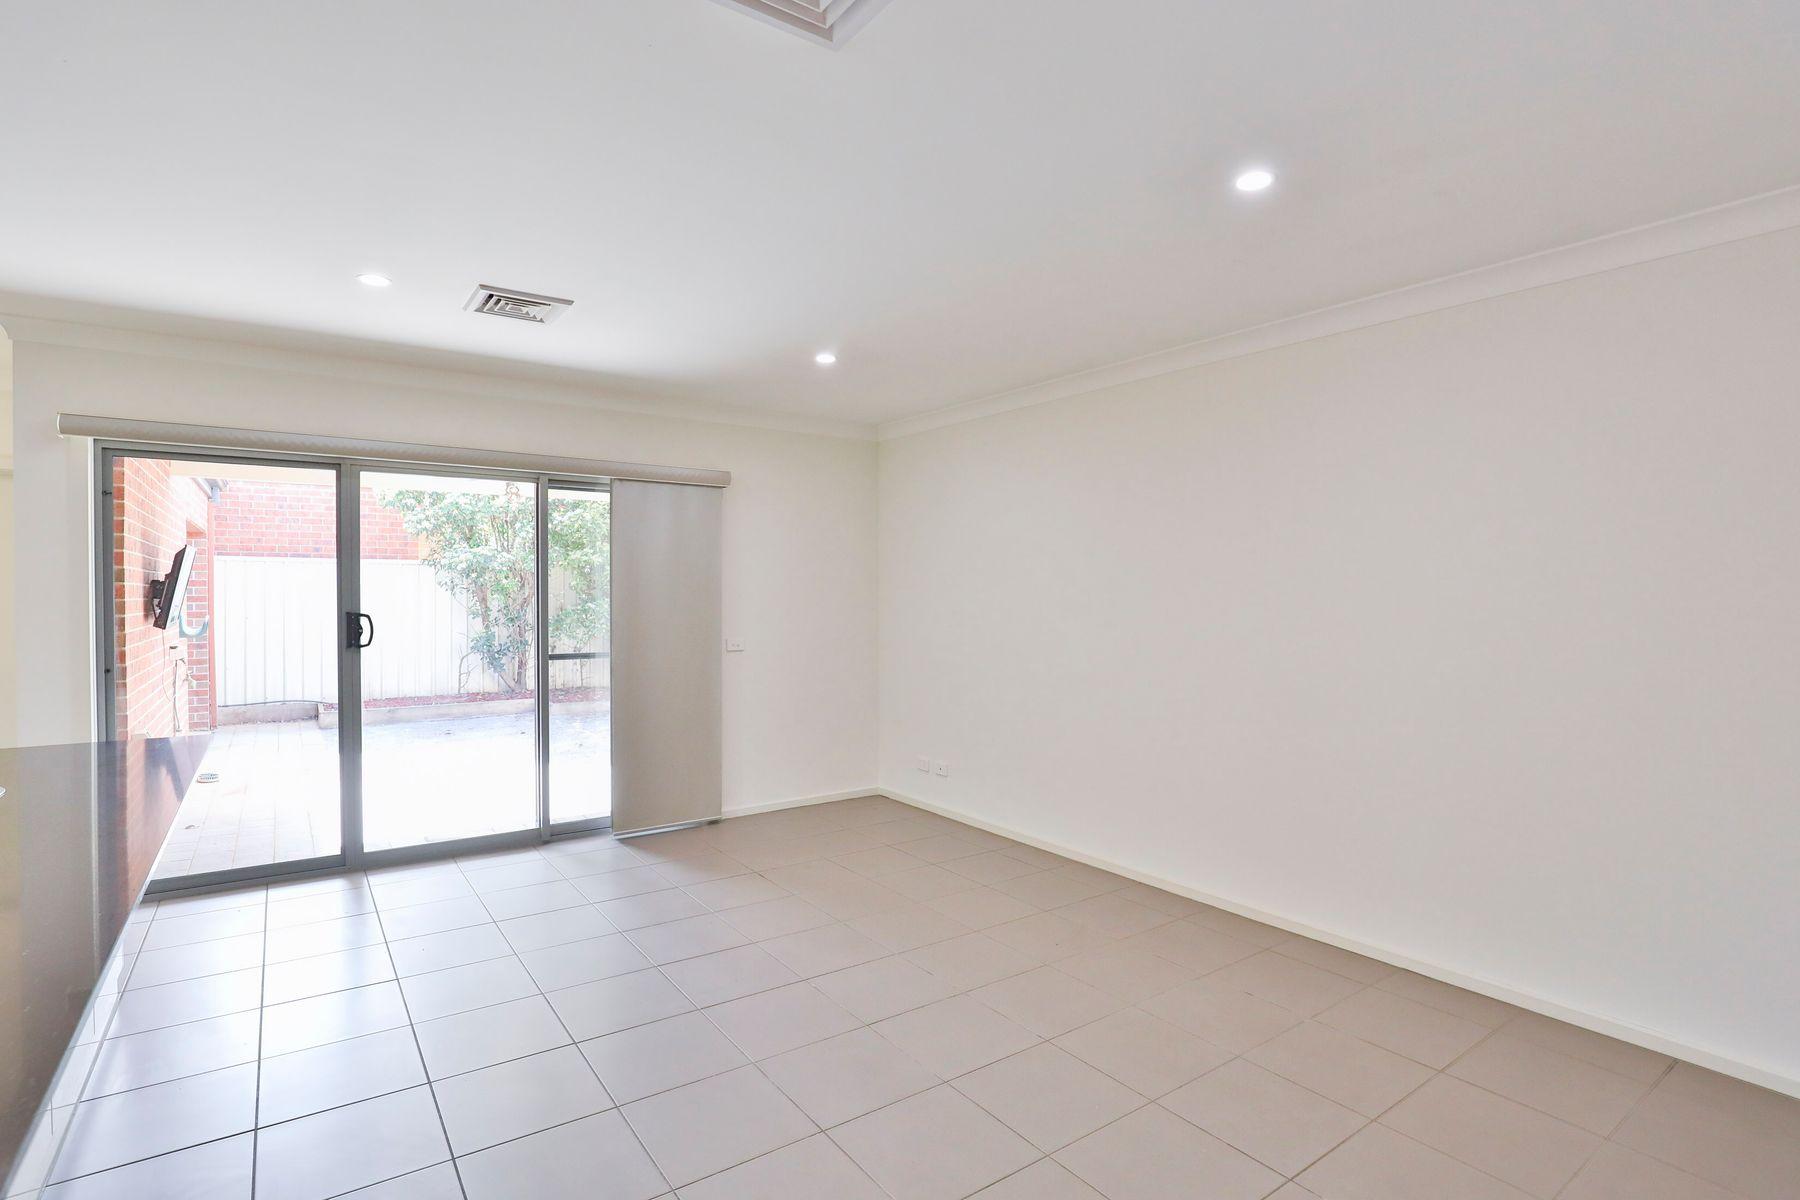 11 Reuben Lock Court, Mildura, VIC 3500